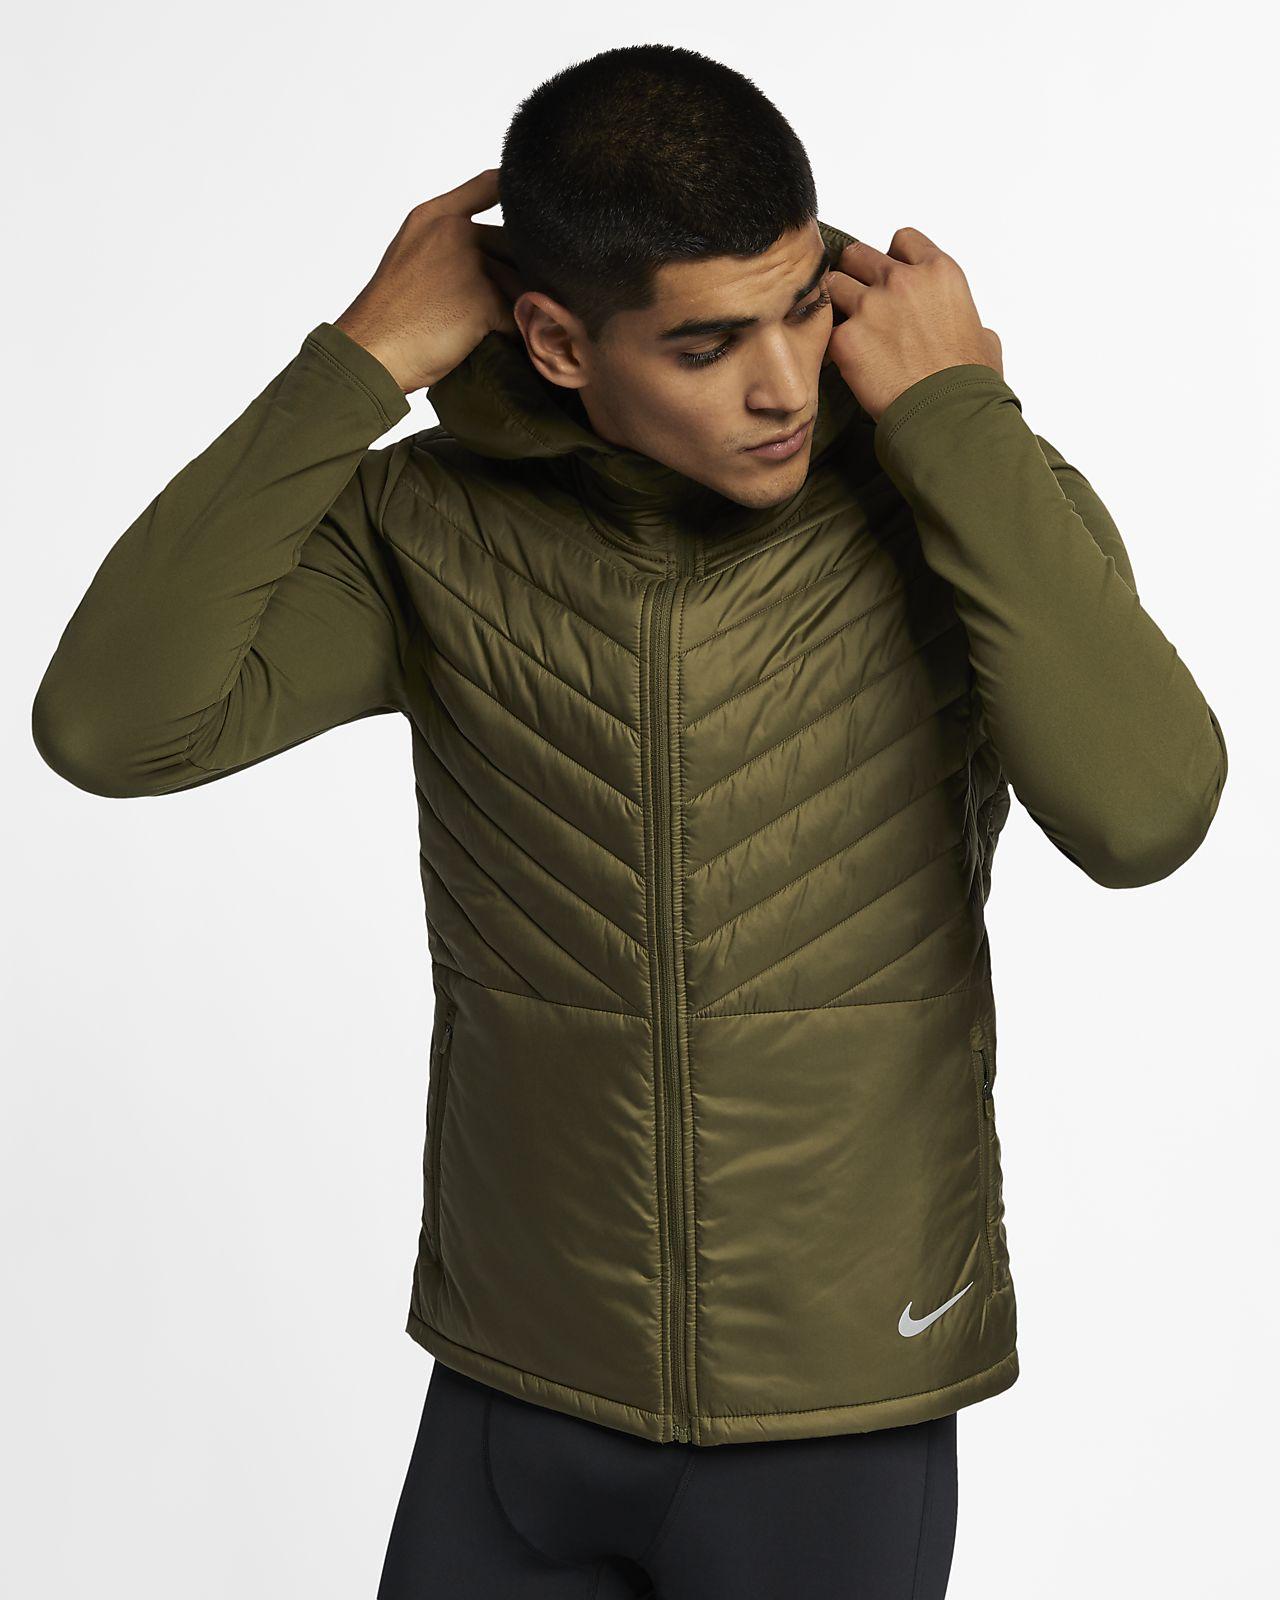 Мужская беговая куртка с капюшоном Nike AeroLayer